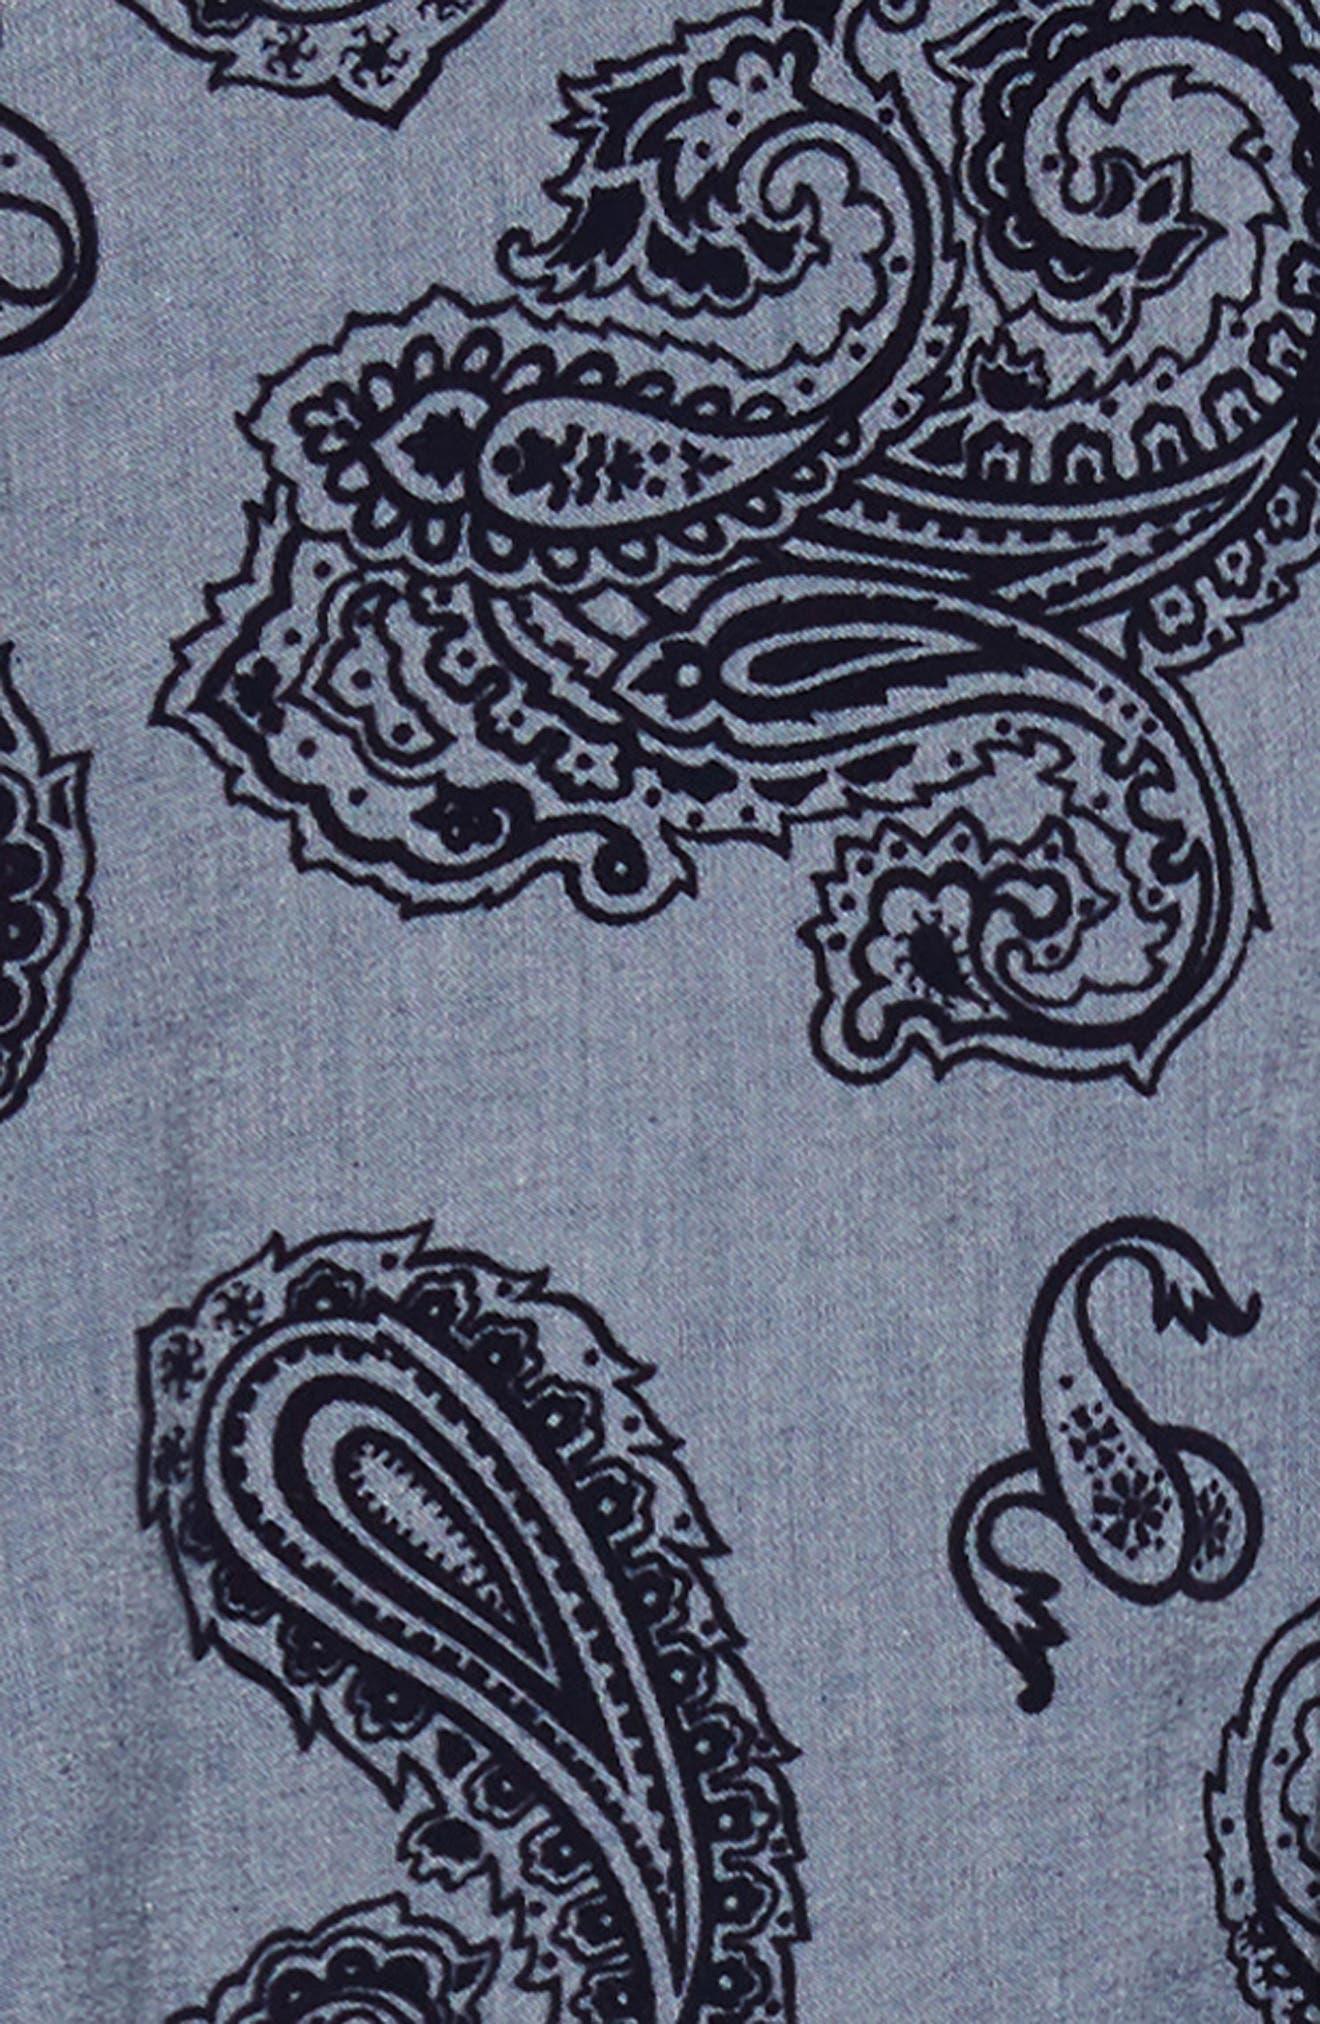 Trim Fit Sport Shirt,                             Alternate thumbnail 6, color,                             BLUE PAISLEY FLOCKING